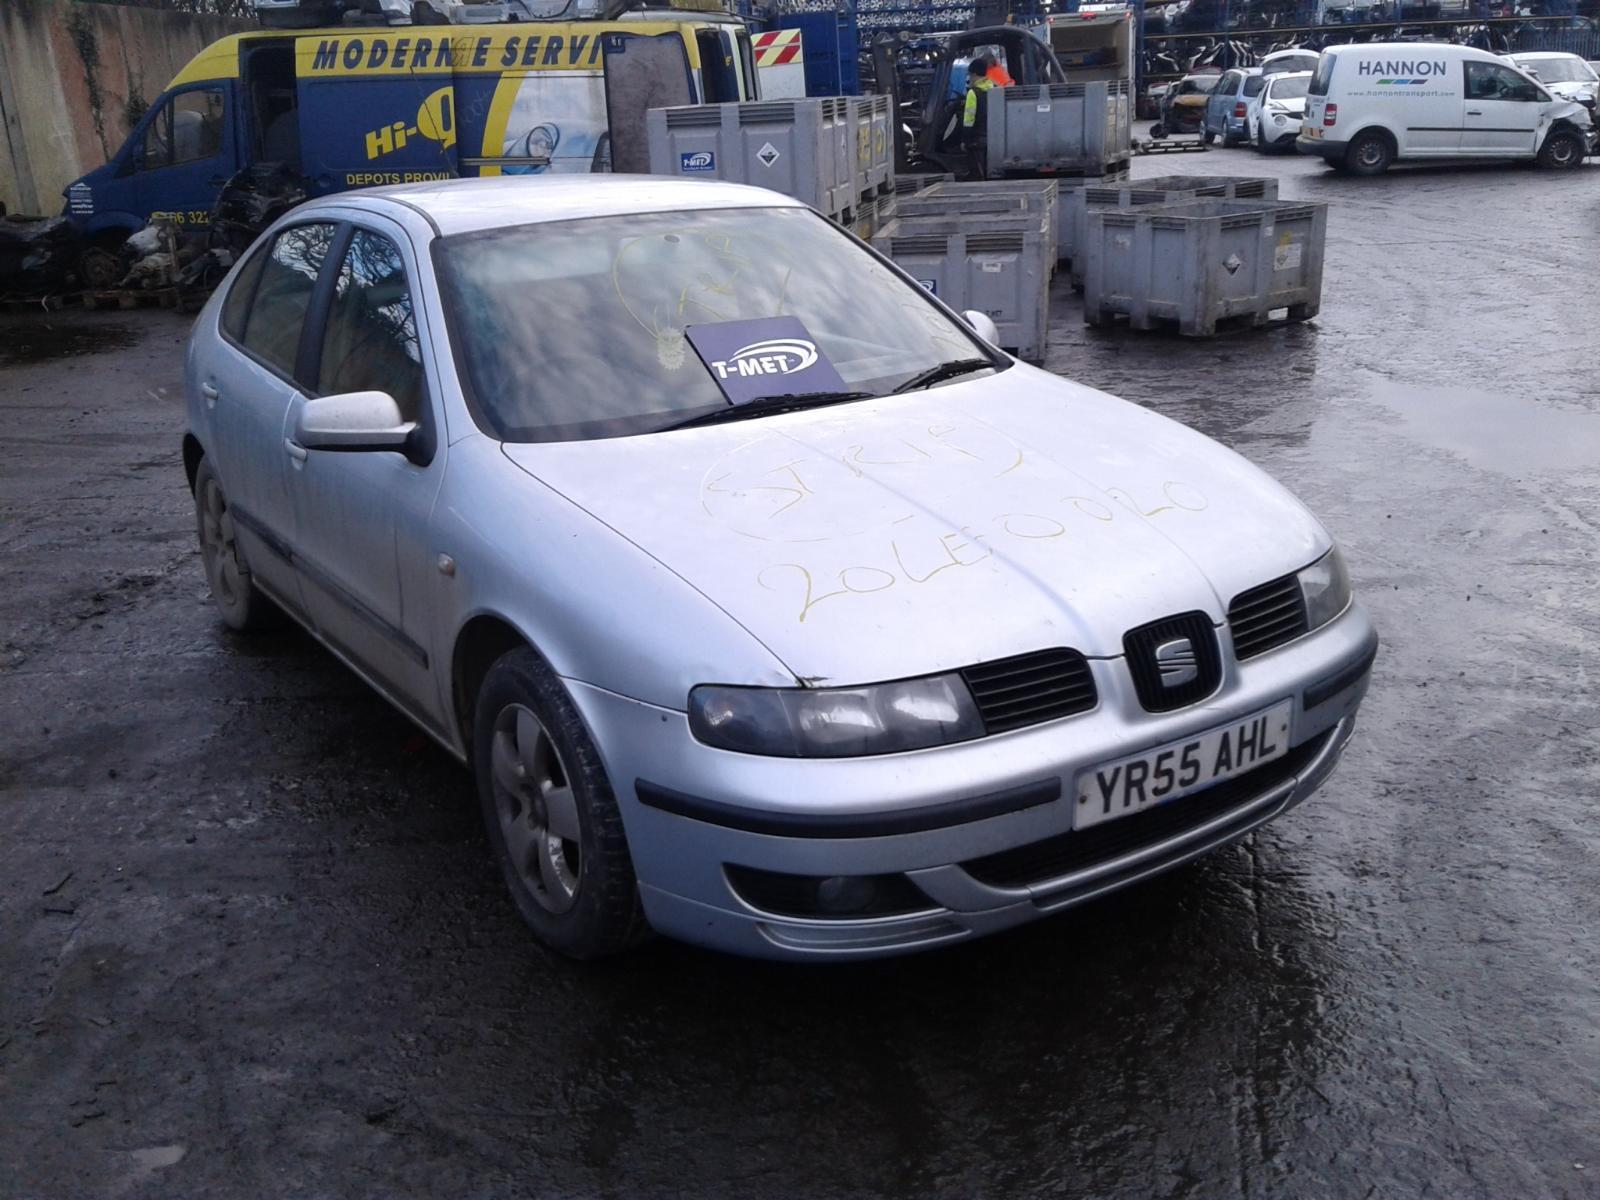 2005 SEAT LEON Image